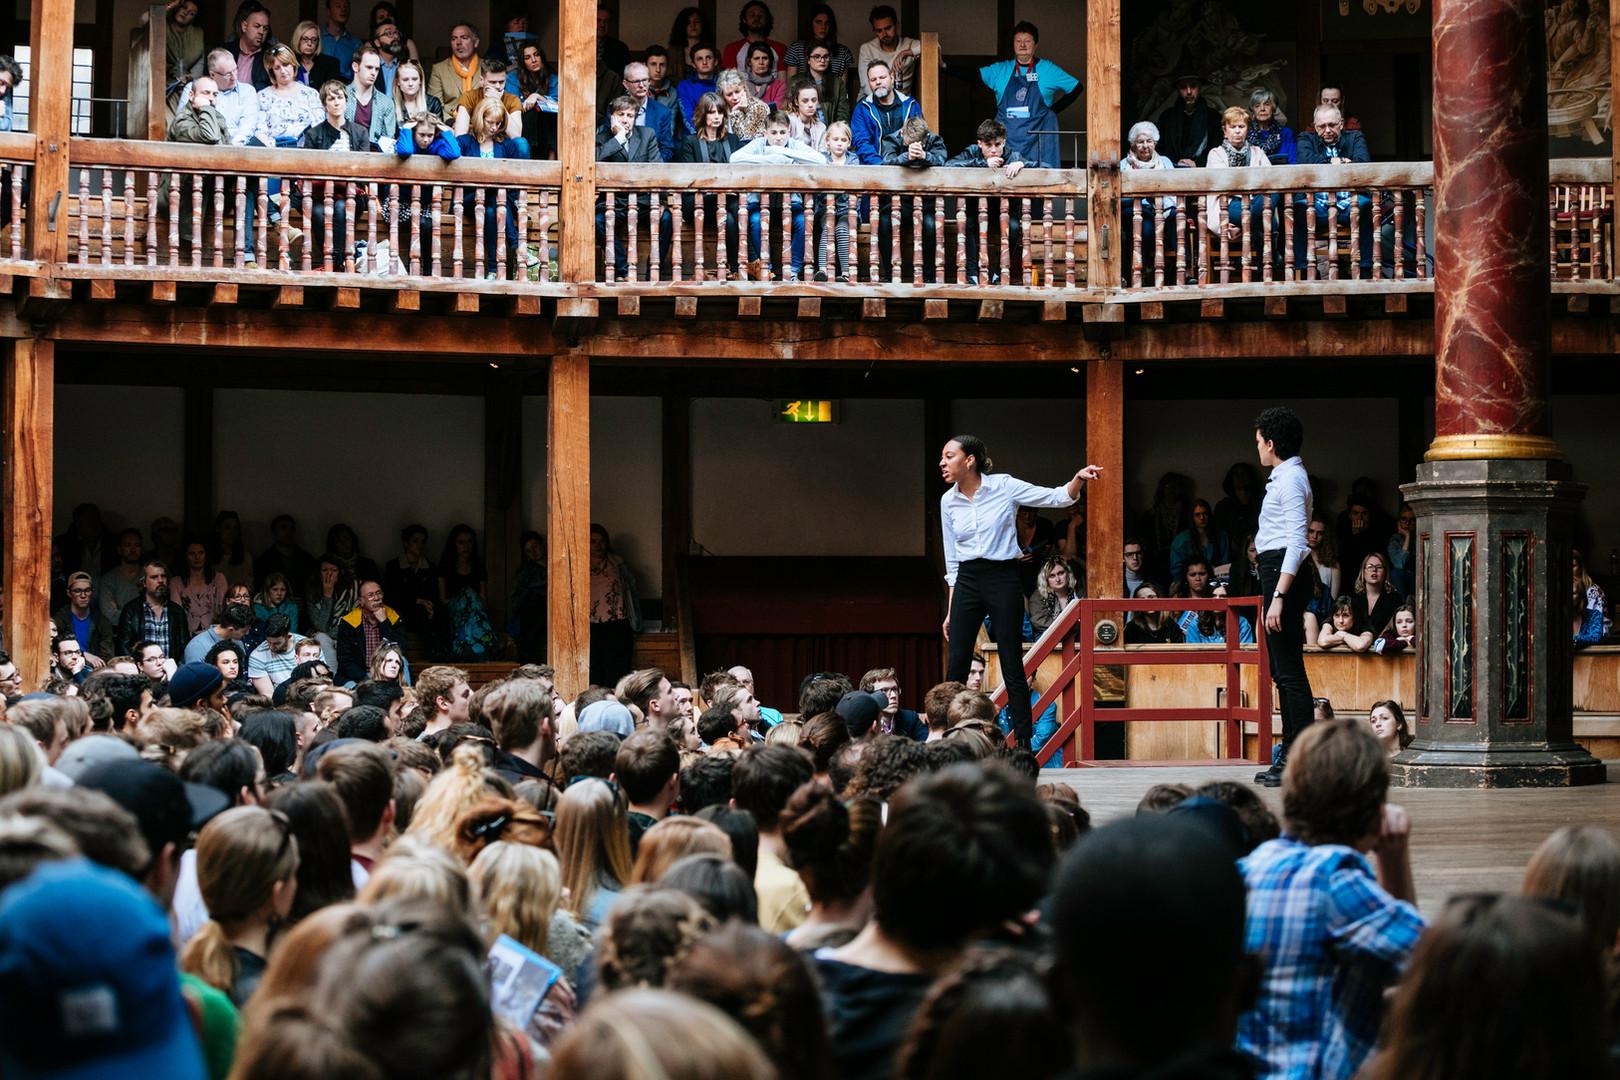 Julius Caesar by William Shakespeare Directed by Simon Dormandy Sam Wanamaker Festival, Shakespeare's Globe in London